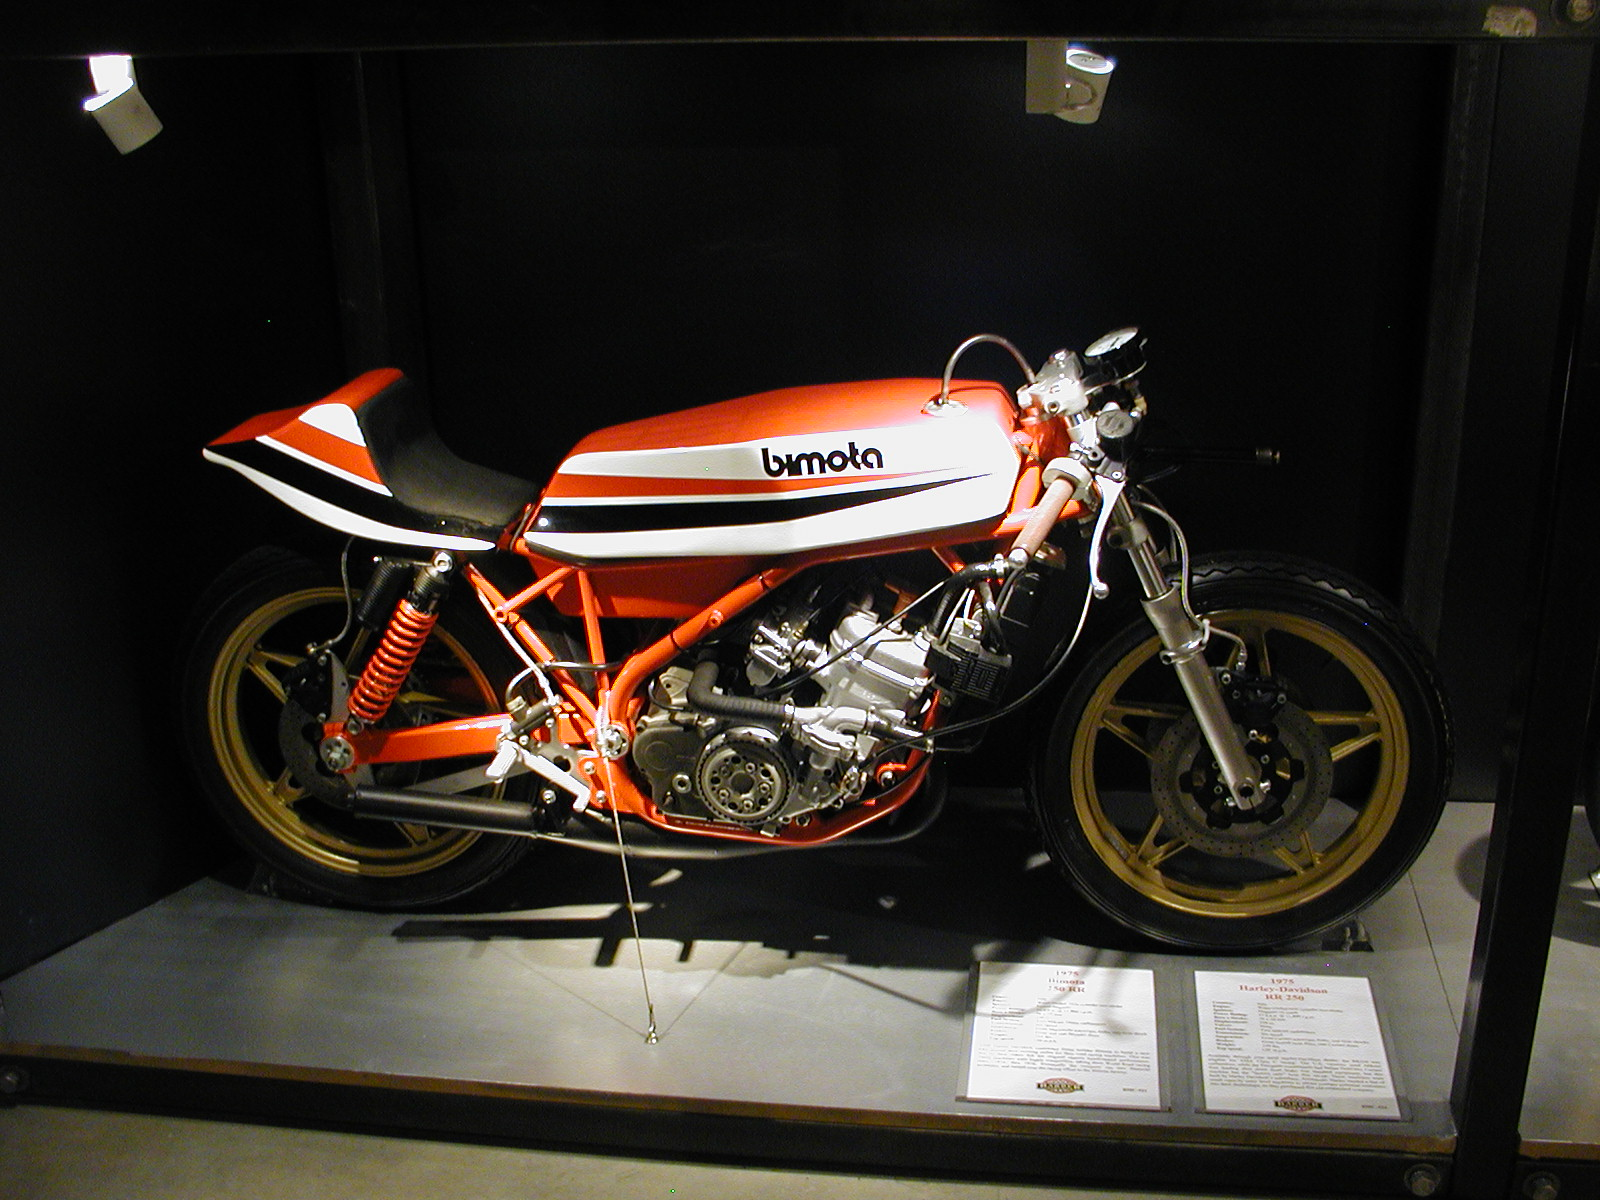 classic bimota motorcycles